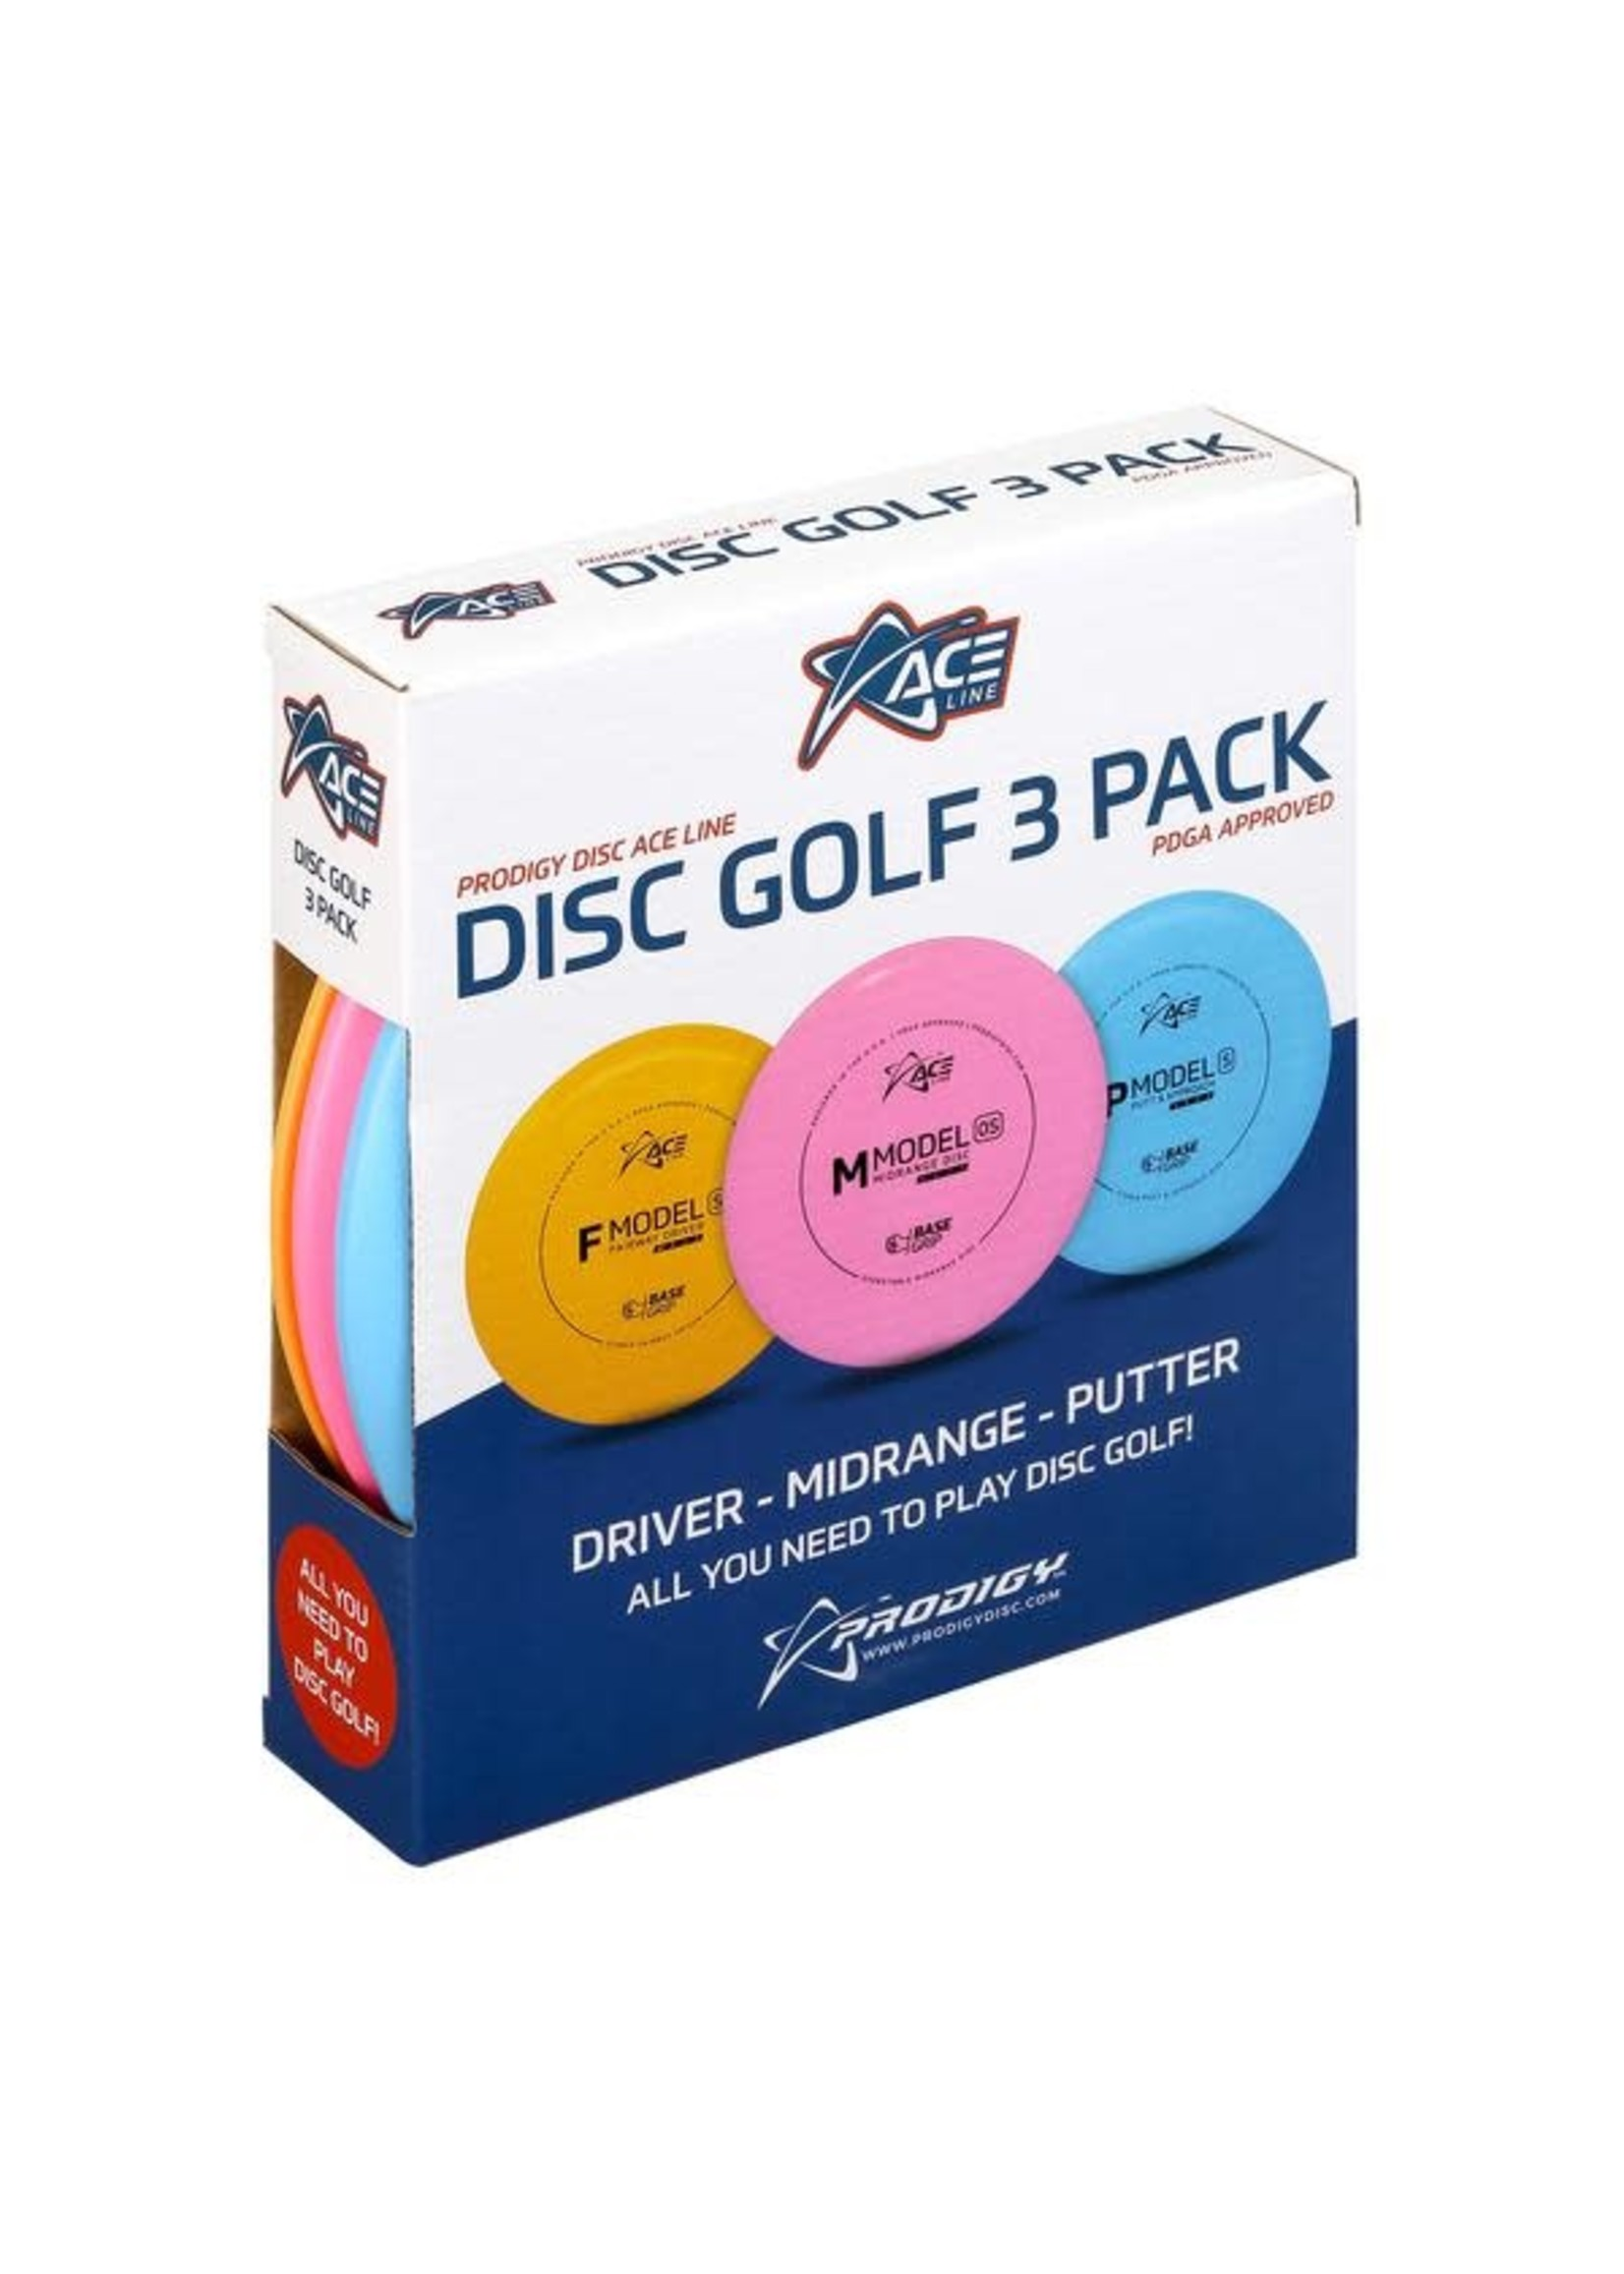 Prodigy Prodigy Ace Disc Golf Starter Pack (3 Discs)